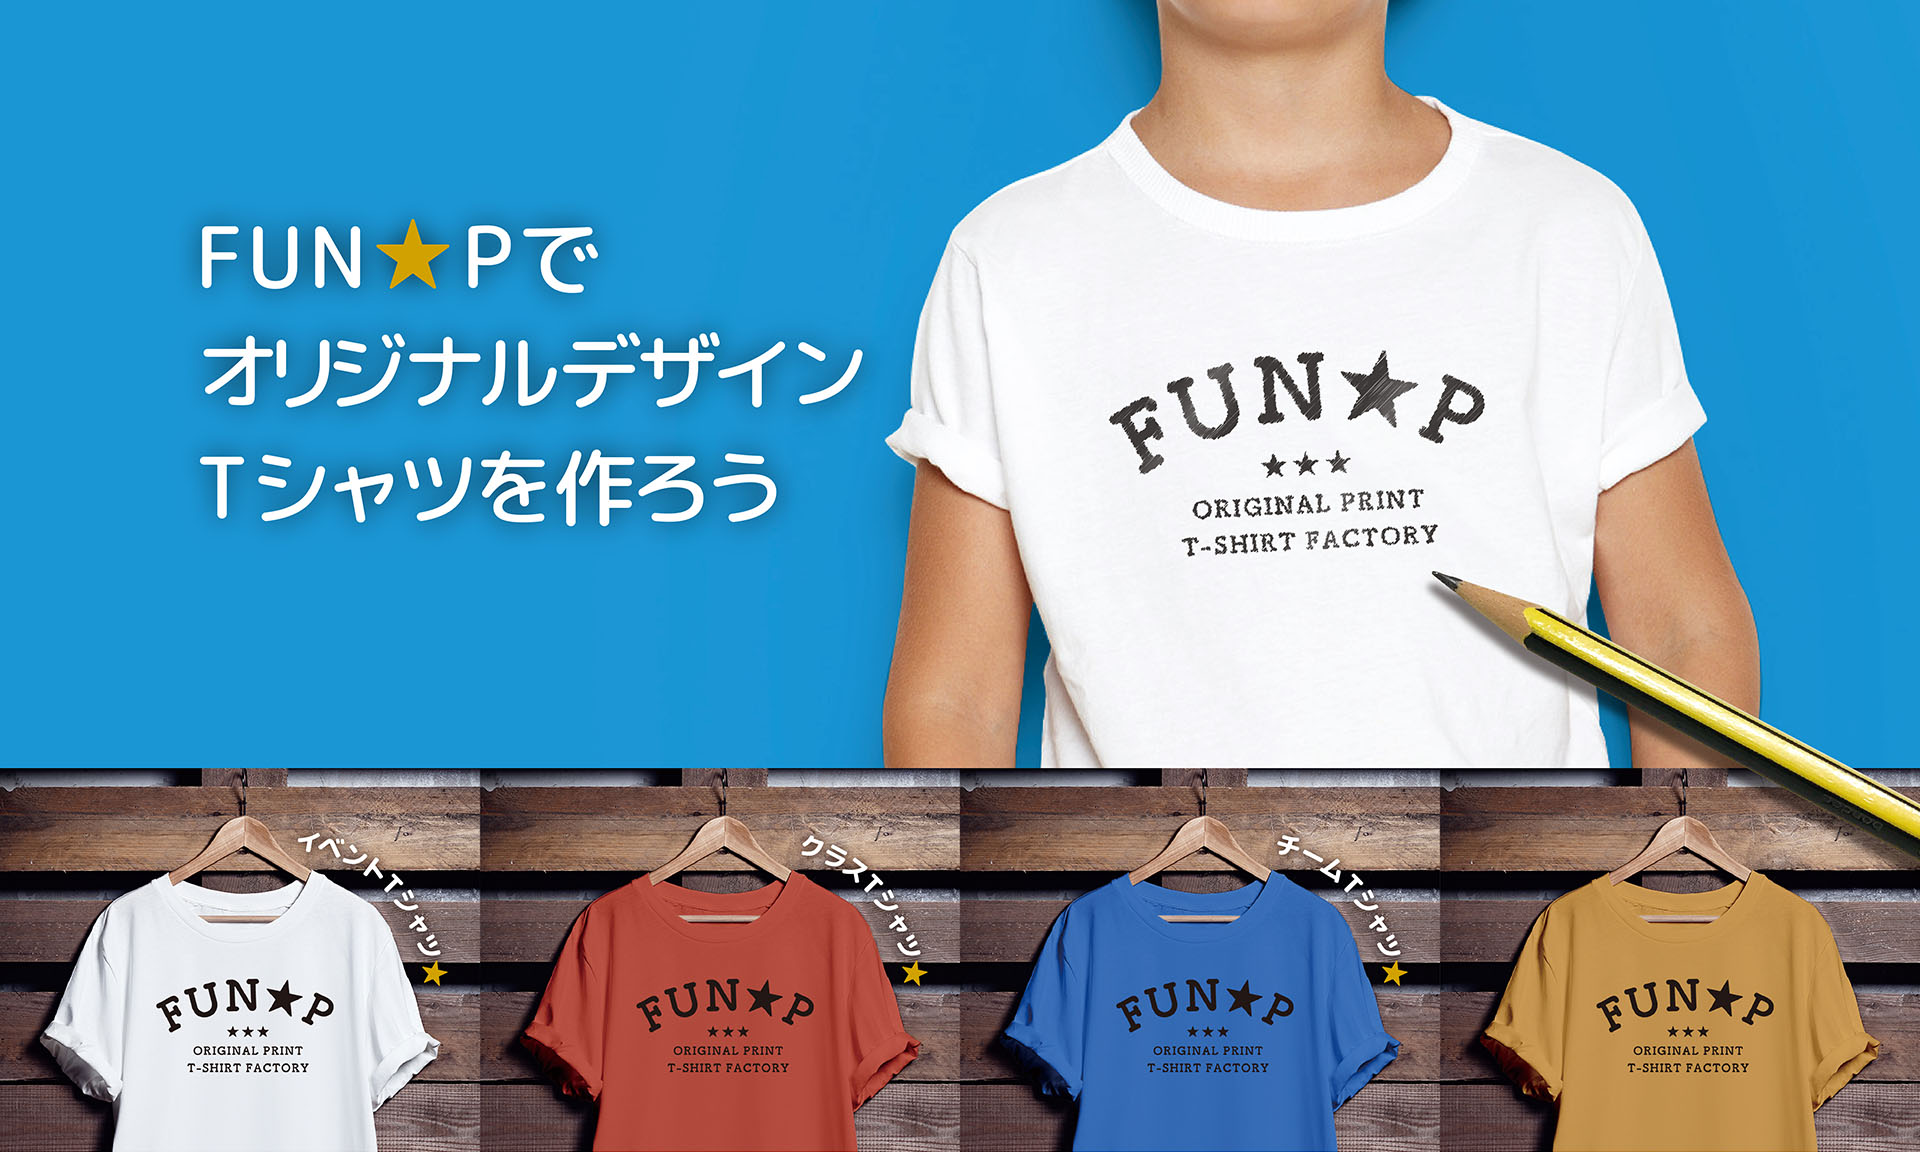 fun-p ファンピーページイメージ